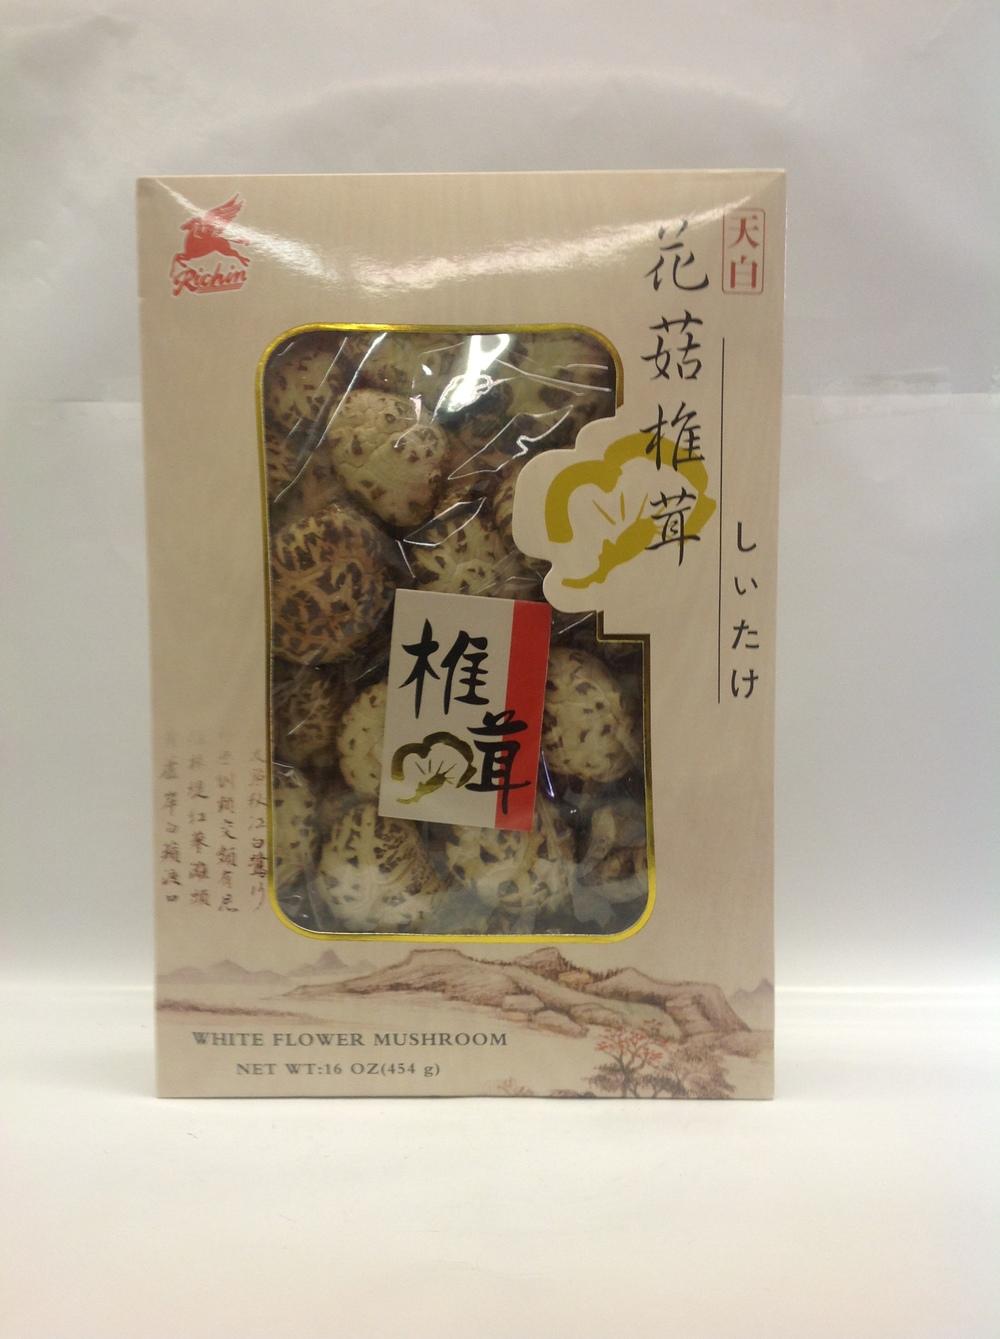 White Flower Mushroom   Richin   DRV5110 20x16 oz